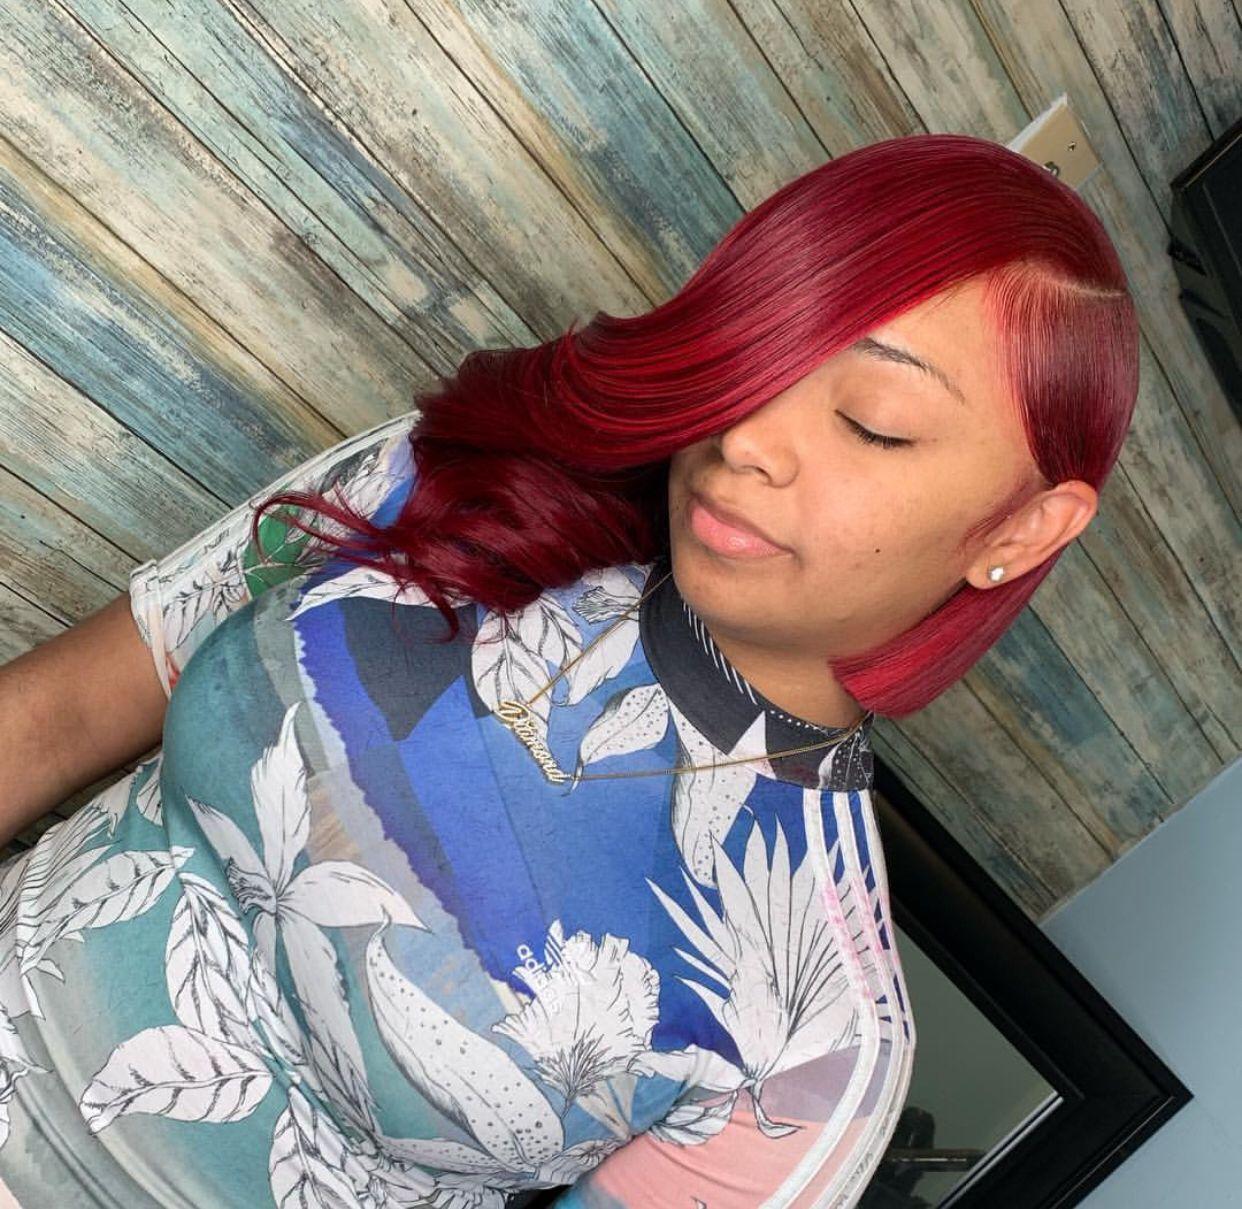 Kamaridenise Short Red Hair Short Weave Hairstyles Cute Hairstyles For Short Hair